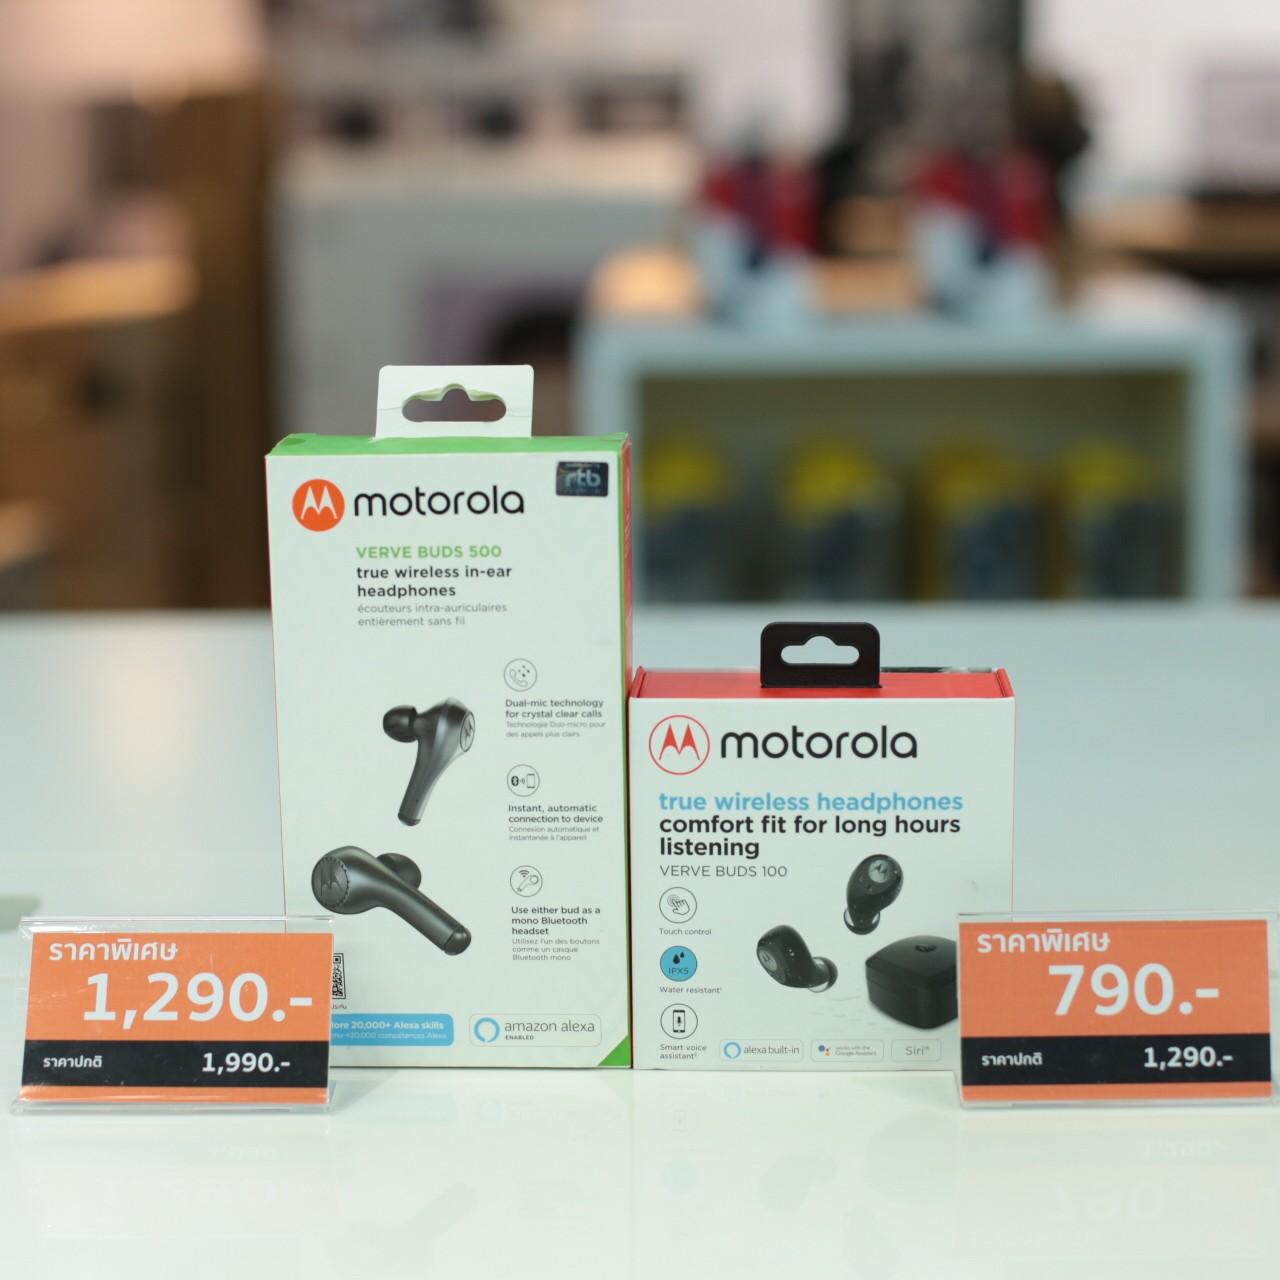 Pic_Motorola หูฟังบลูทูธไร้สาย รุ่น VerveBuds 100 และ Motorola VerveBuds 500